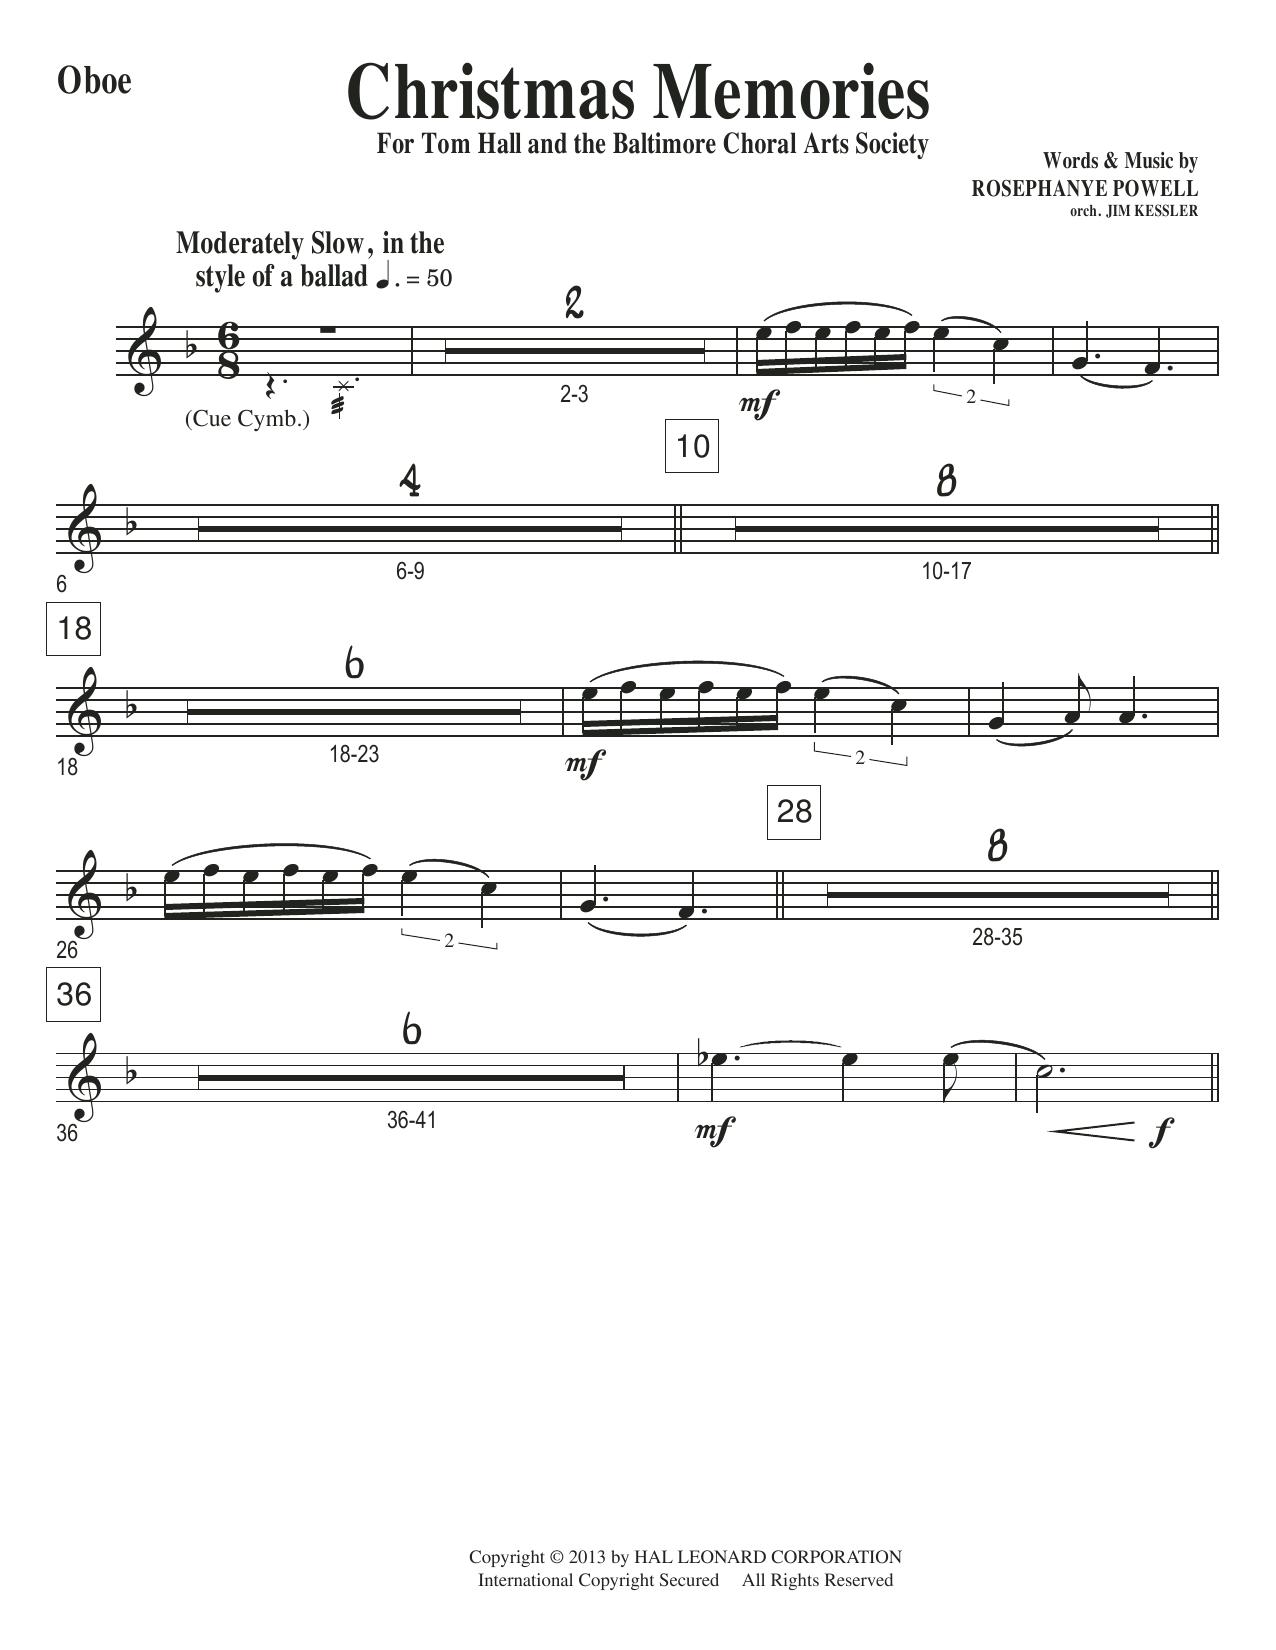 Christmas Memories - Oboe Sheet Music